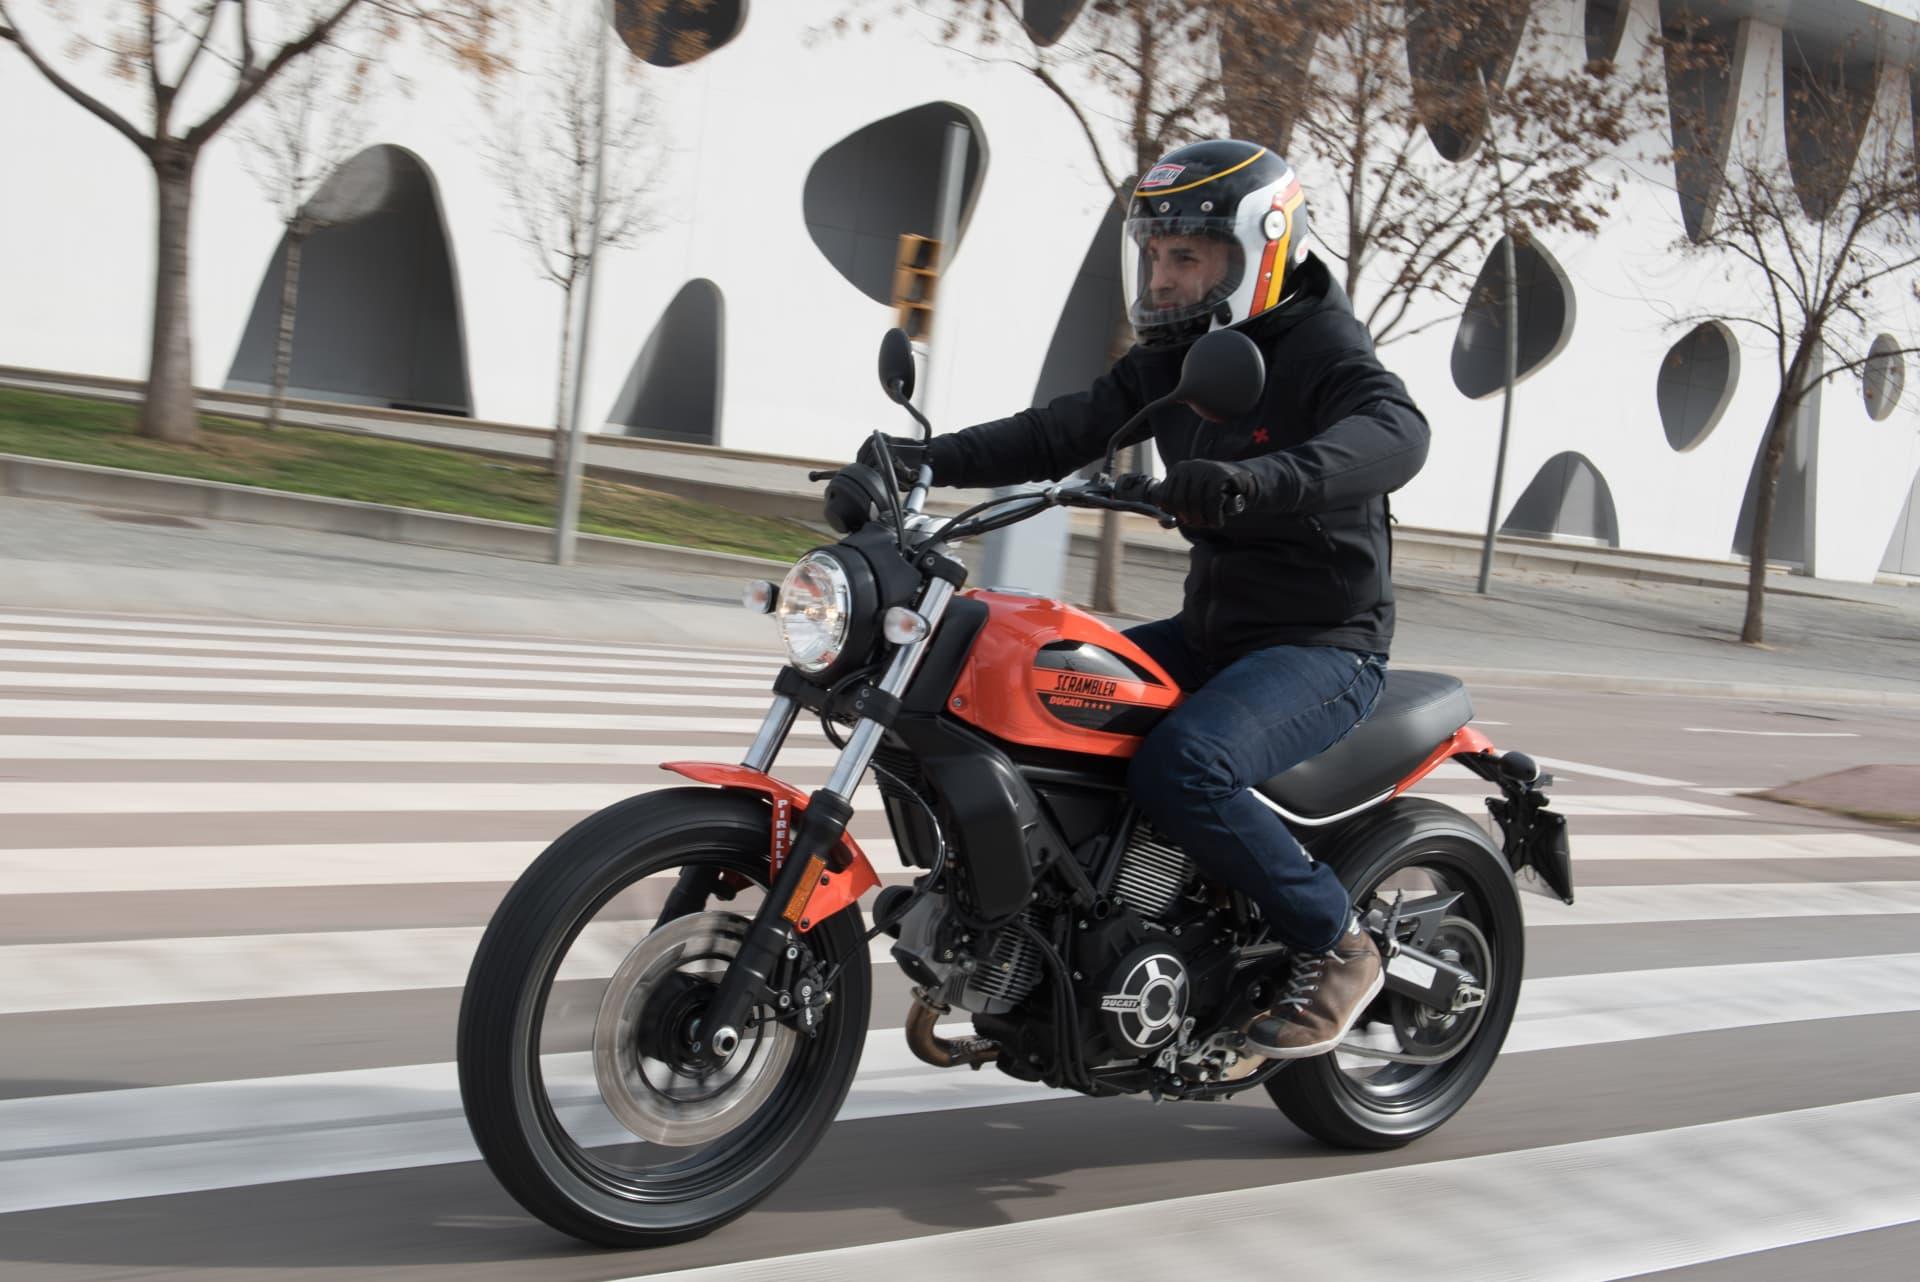 Ducati Scrambler Sixty2 L75 7924 Uc37092 High